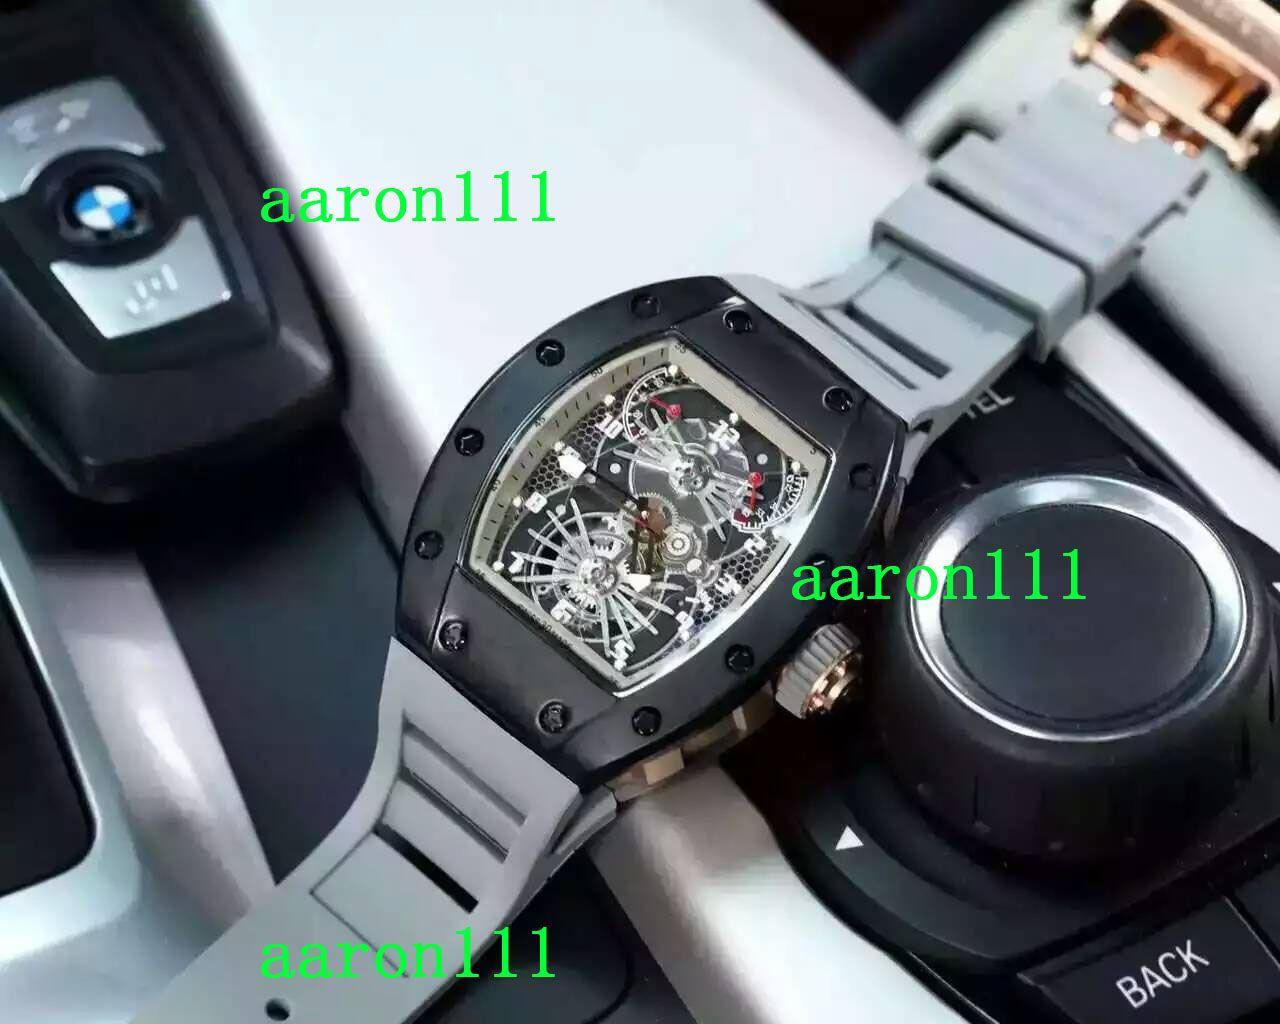 Top Marke Schwarz Edelstahl Fall RM022 Tonneau Grau Gummi Gürtel Männer Luxus Automatische Mechanische Uhr Tauch Herren Business Armbanduhren Dropship